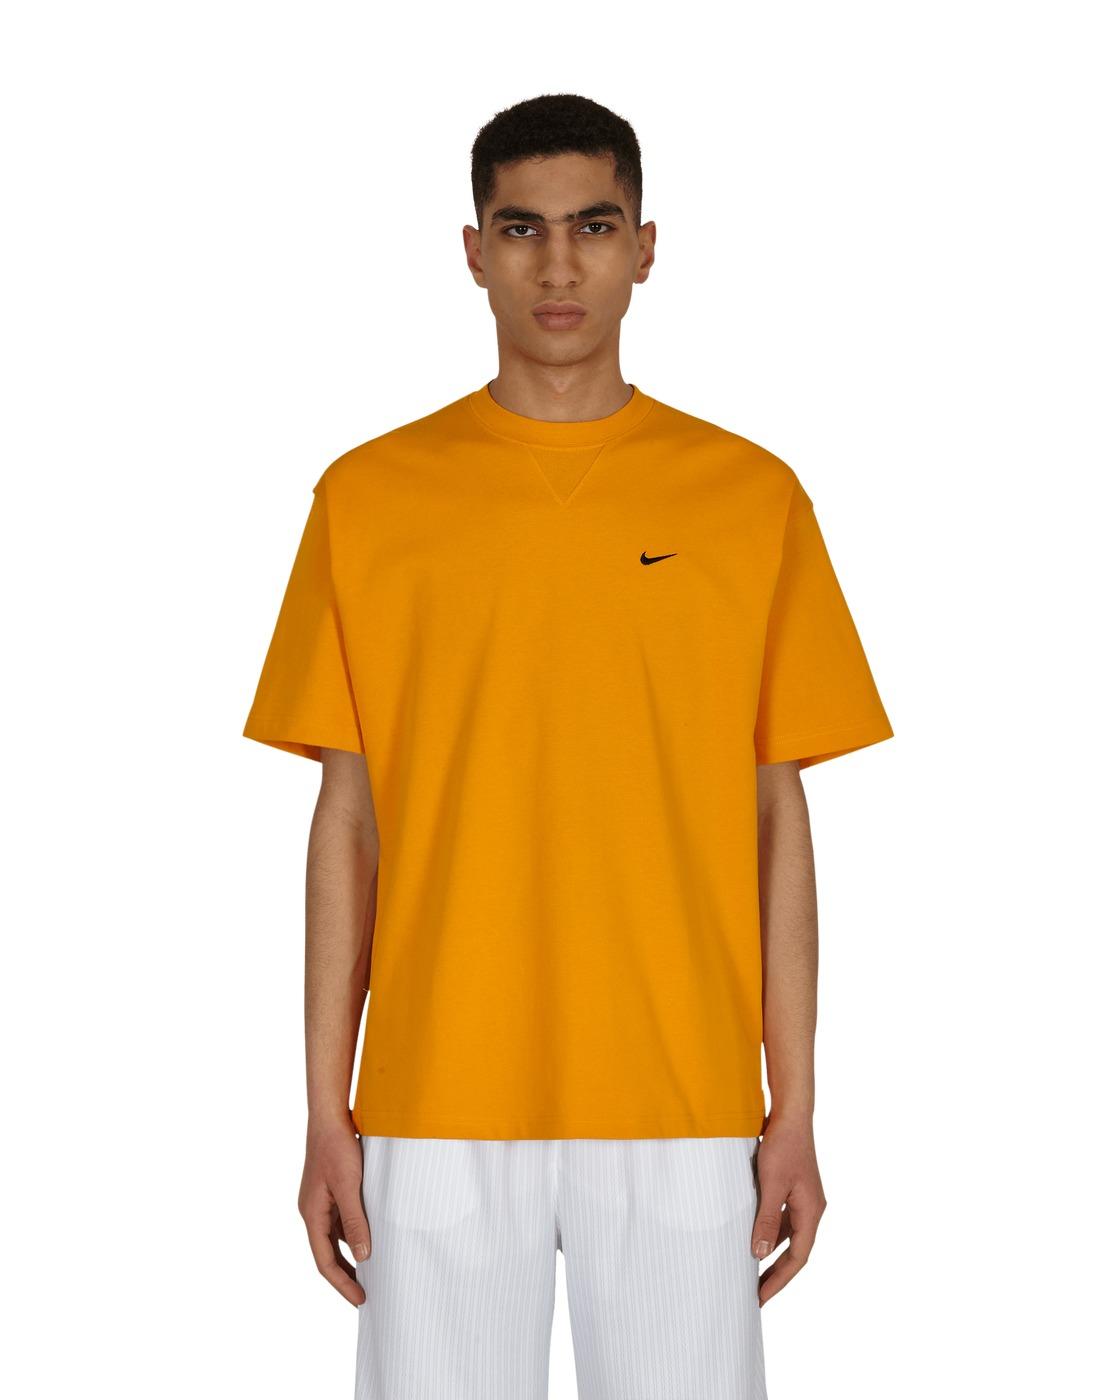 Nike Special Project Kim Jones T Shirt Circuit Orange